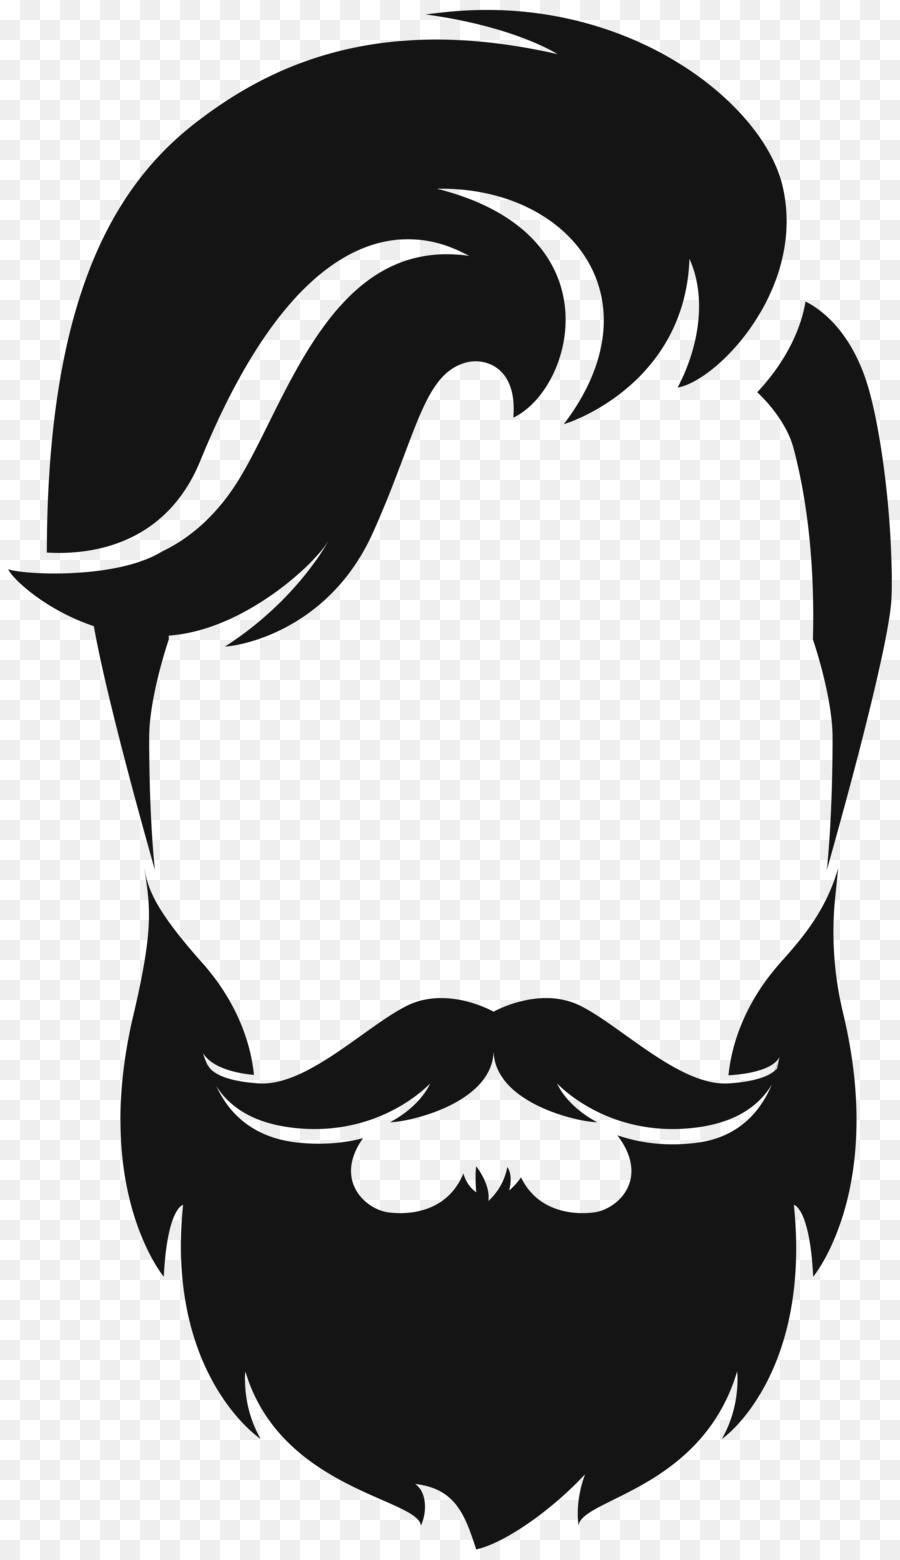 silhouette beard moustache clip art hair style png download 4626 rh kisspng com beard clip art free bear clip art